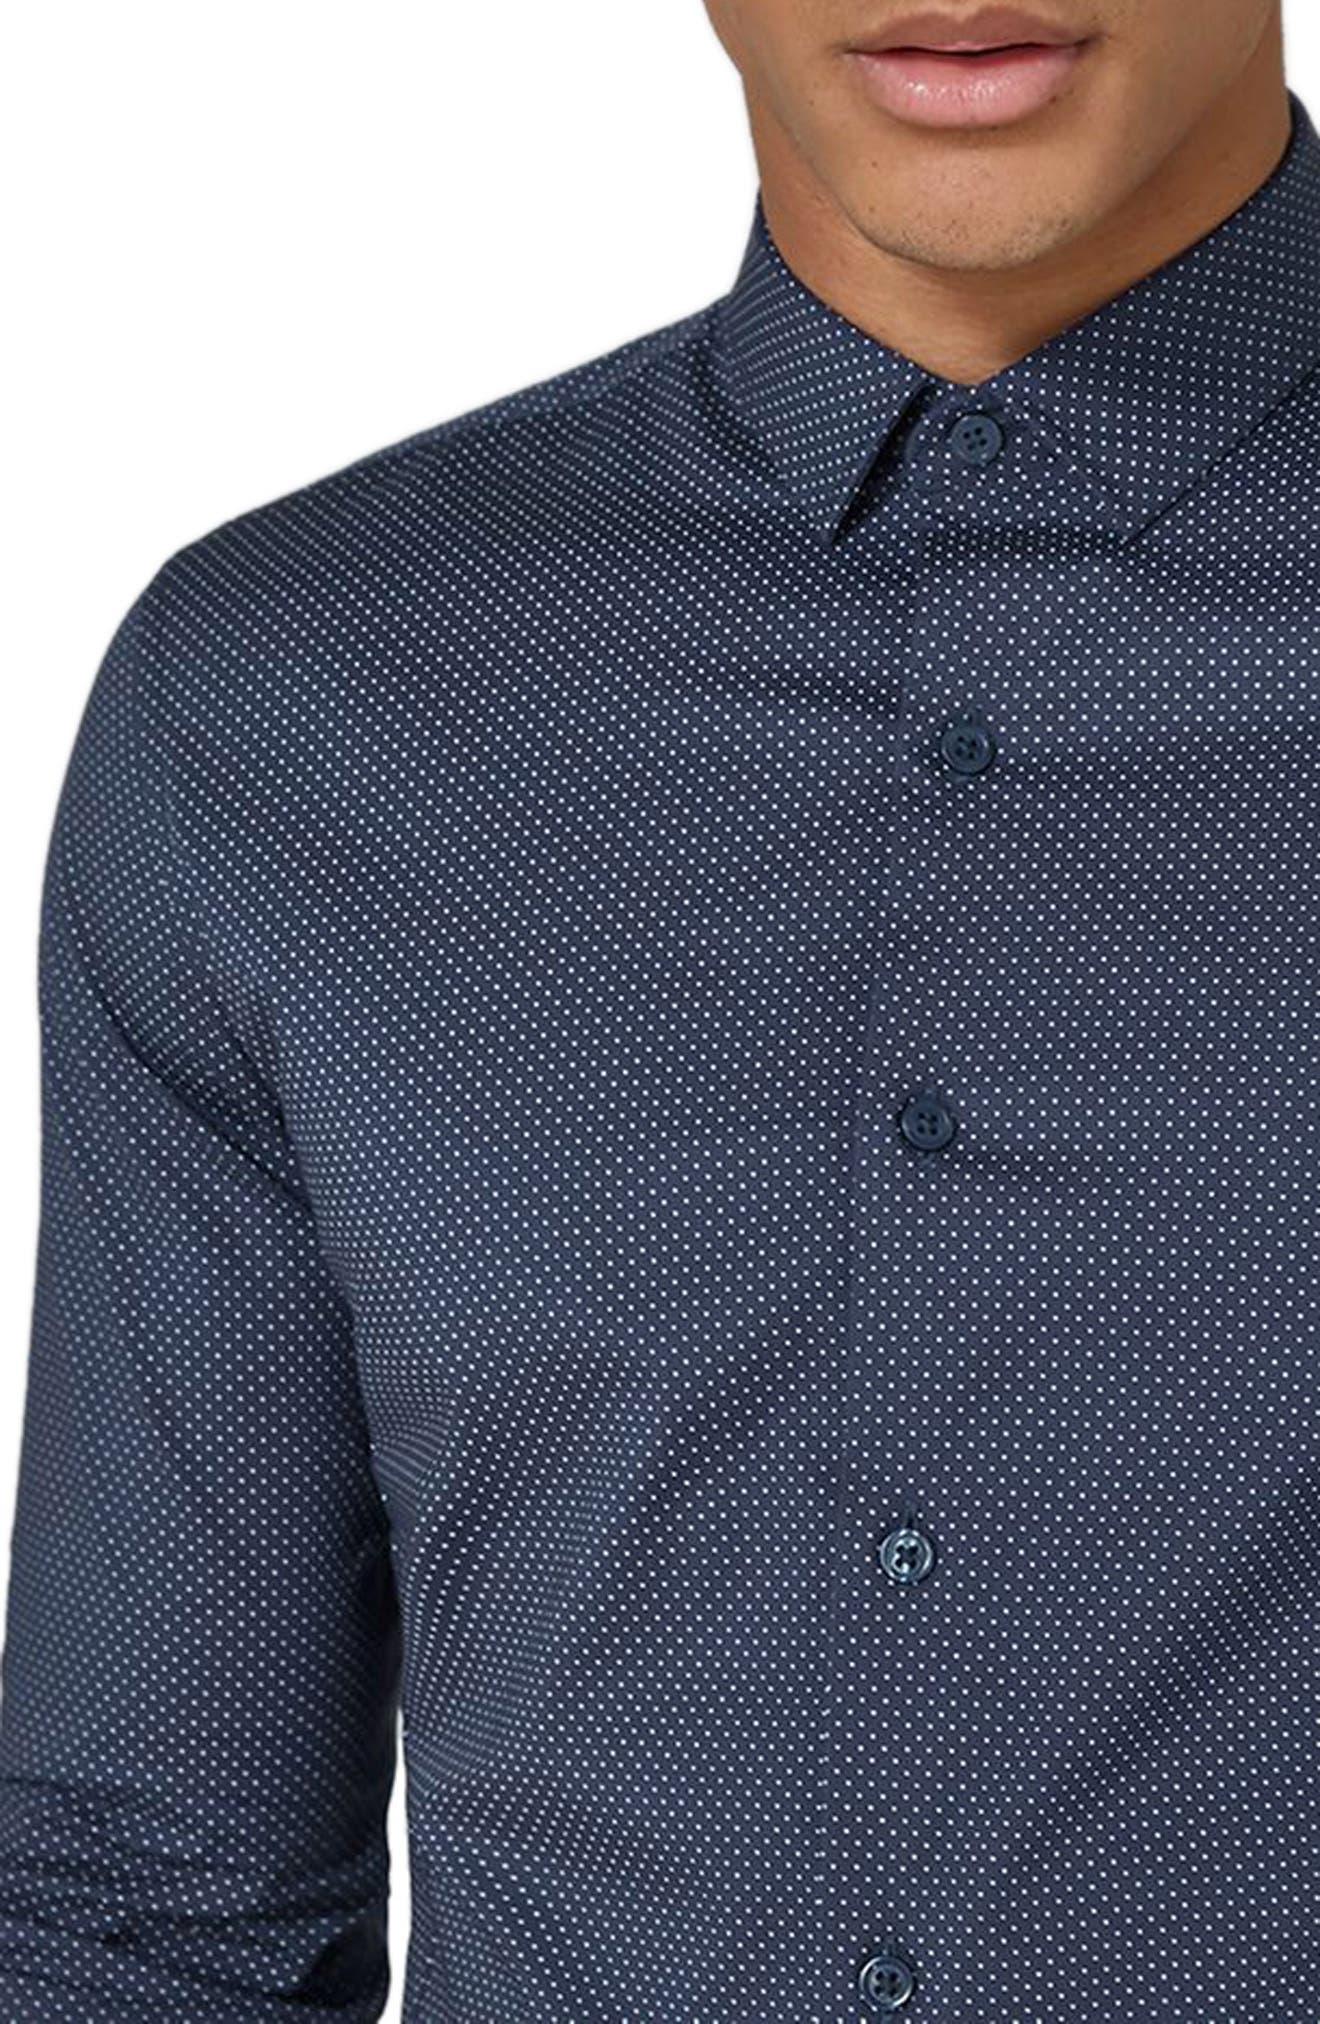 Alternate Image 3  - Topman Polka Dot Stretch Smart Shirt